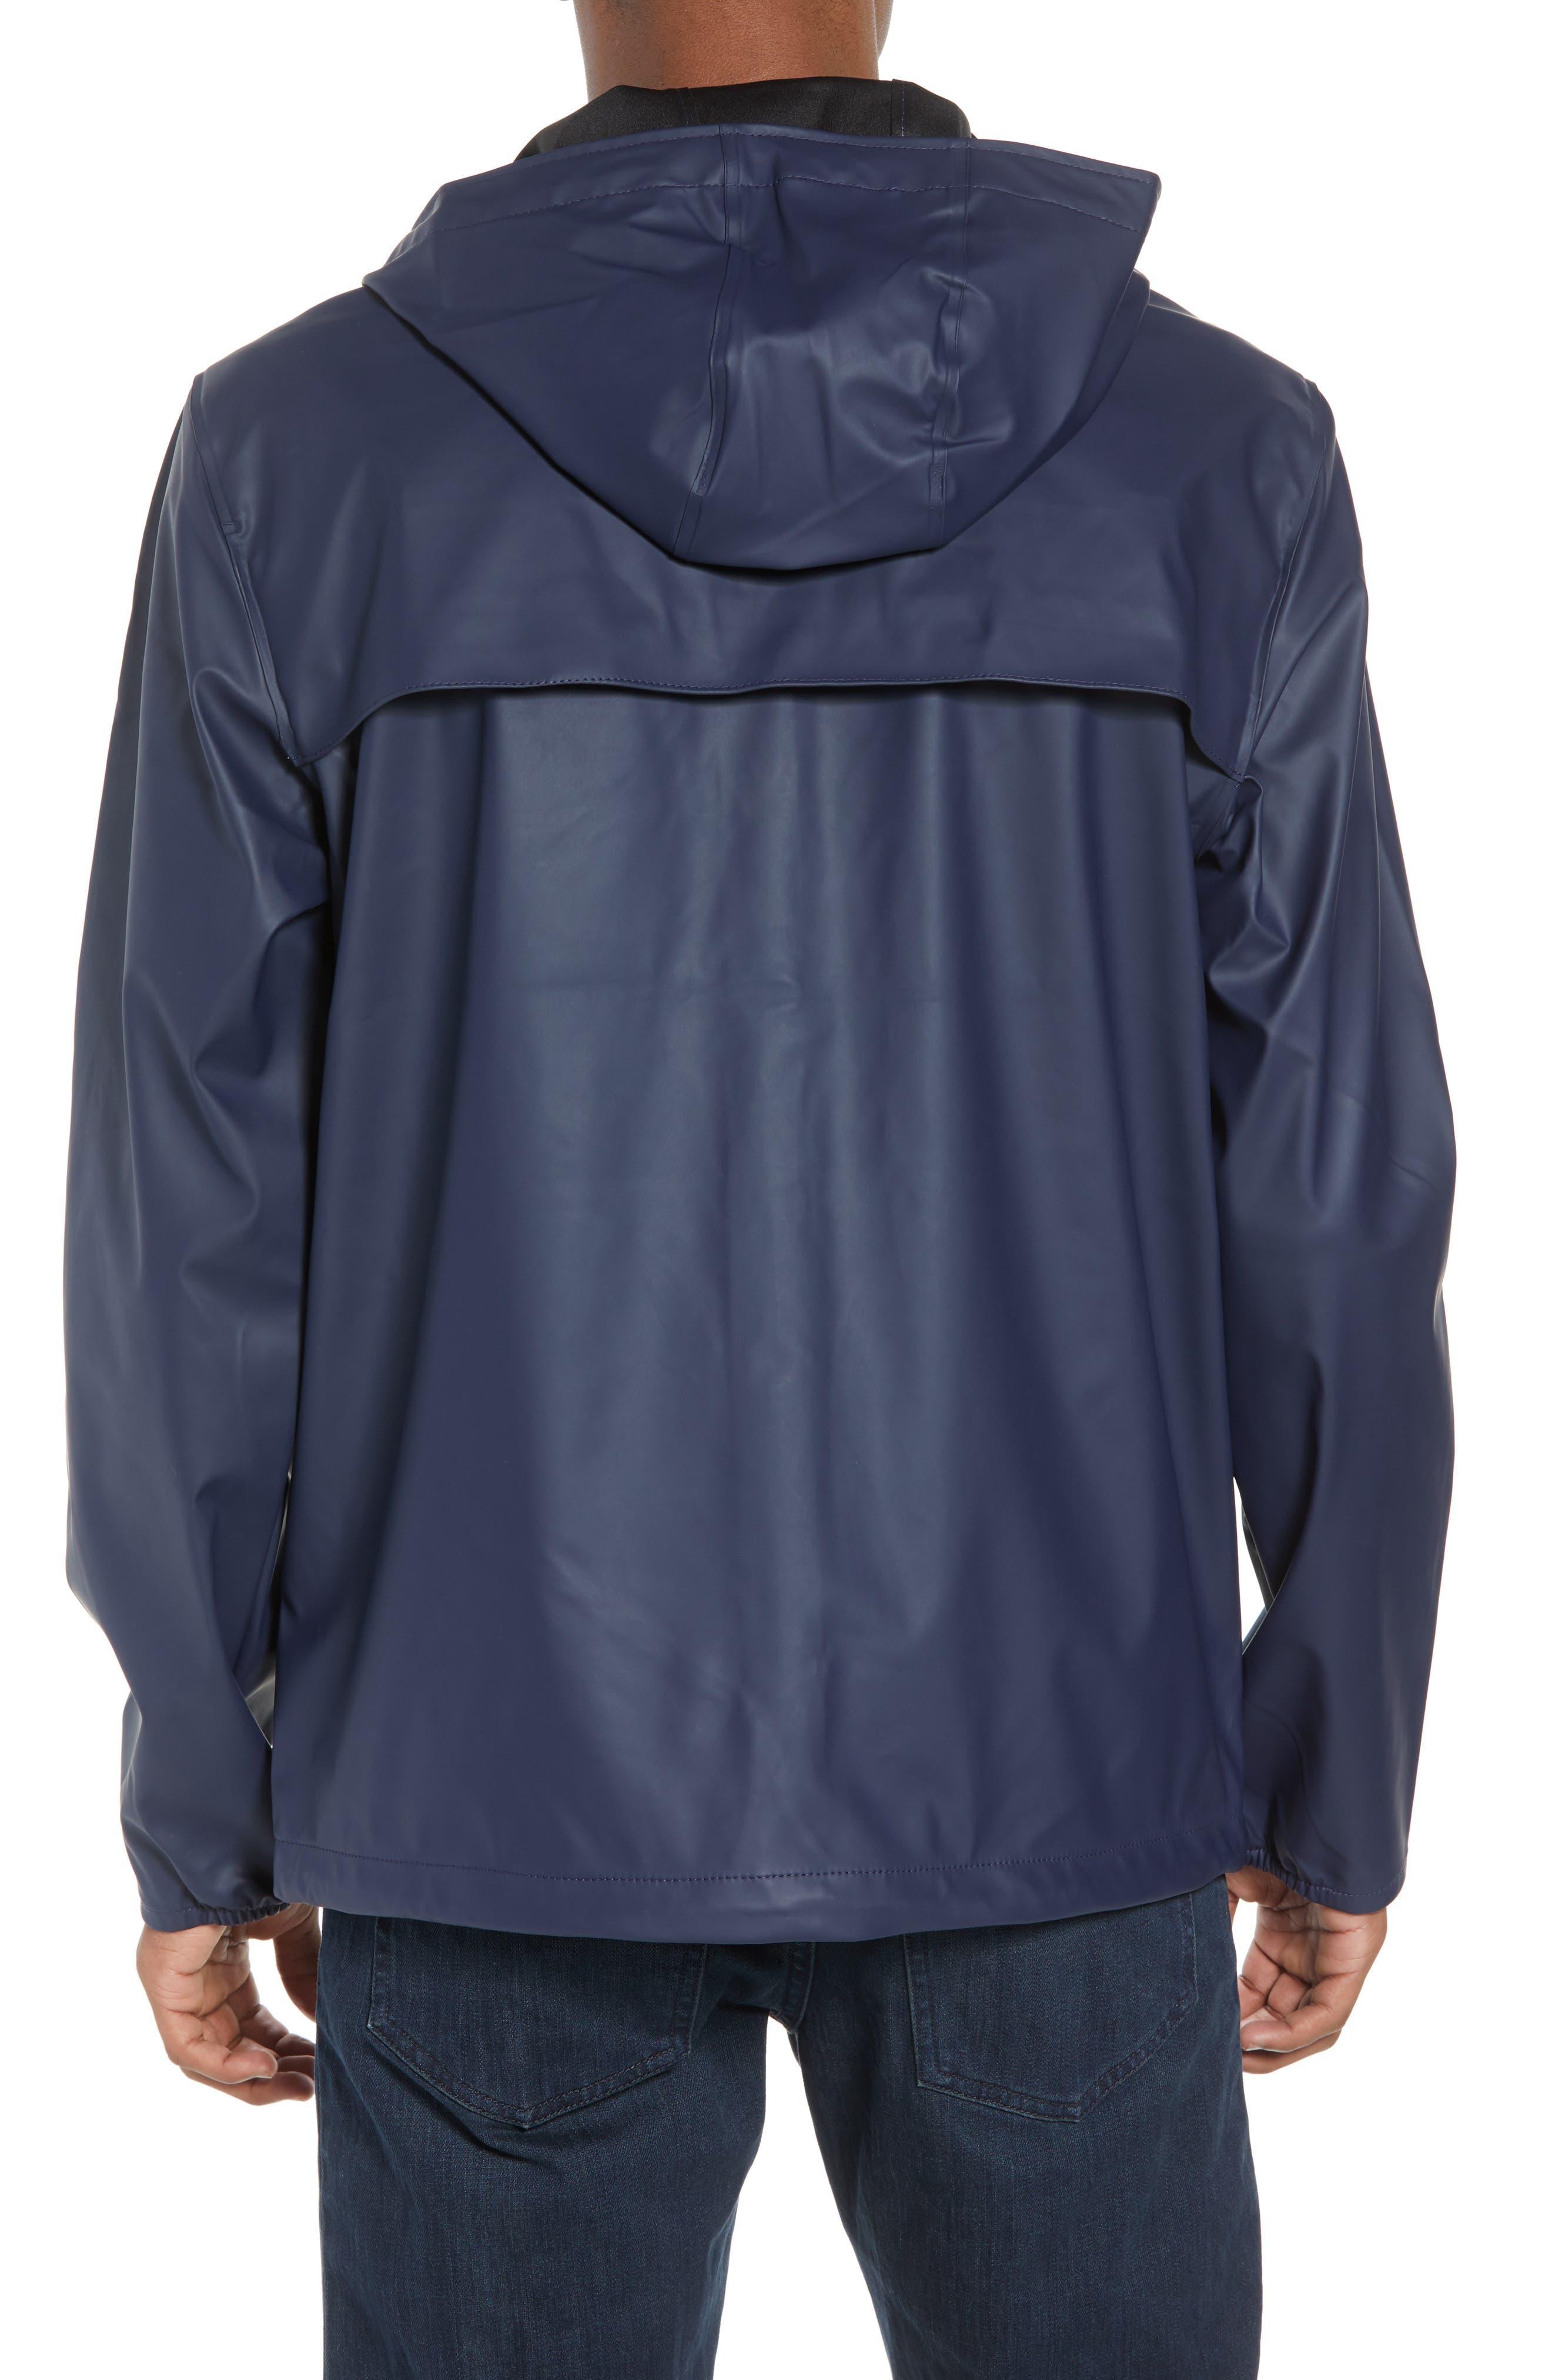 Forecast Hooded Coaches Jacket,                             Alternate thumbnail 2, color,                             Peacoat/ Peacoat